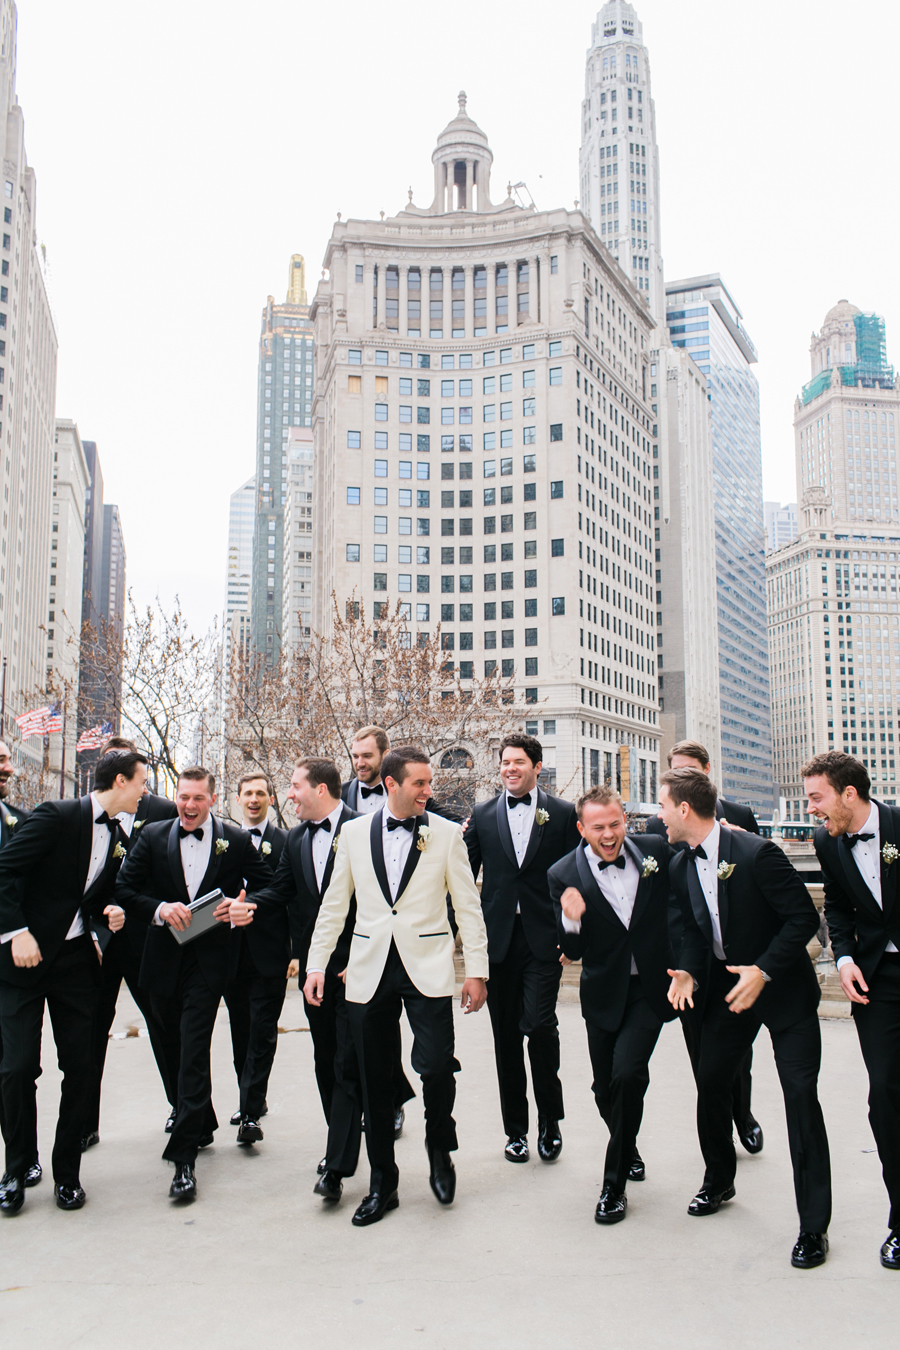 artistrie-co-best-wedding-photos-2015-004